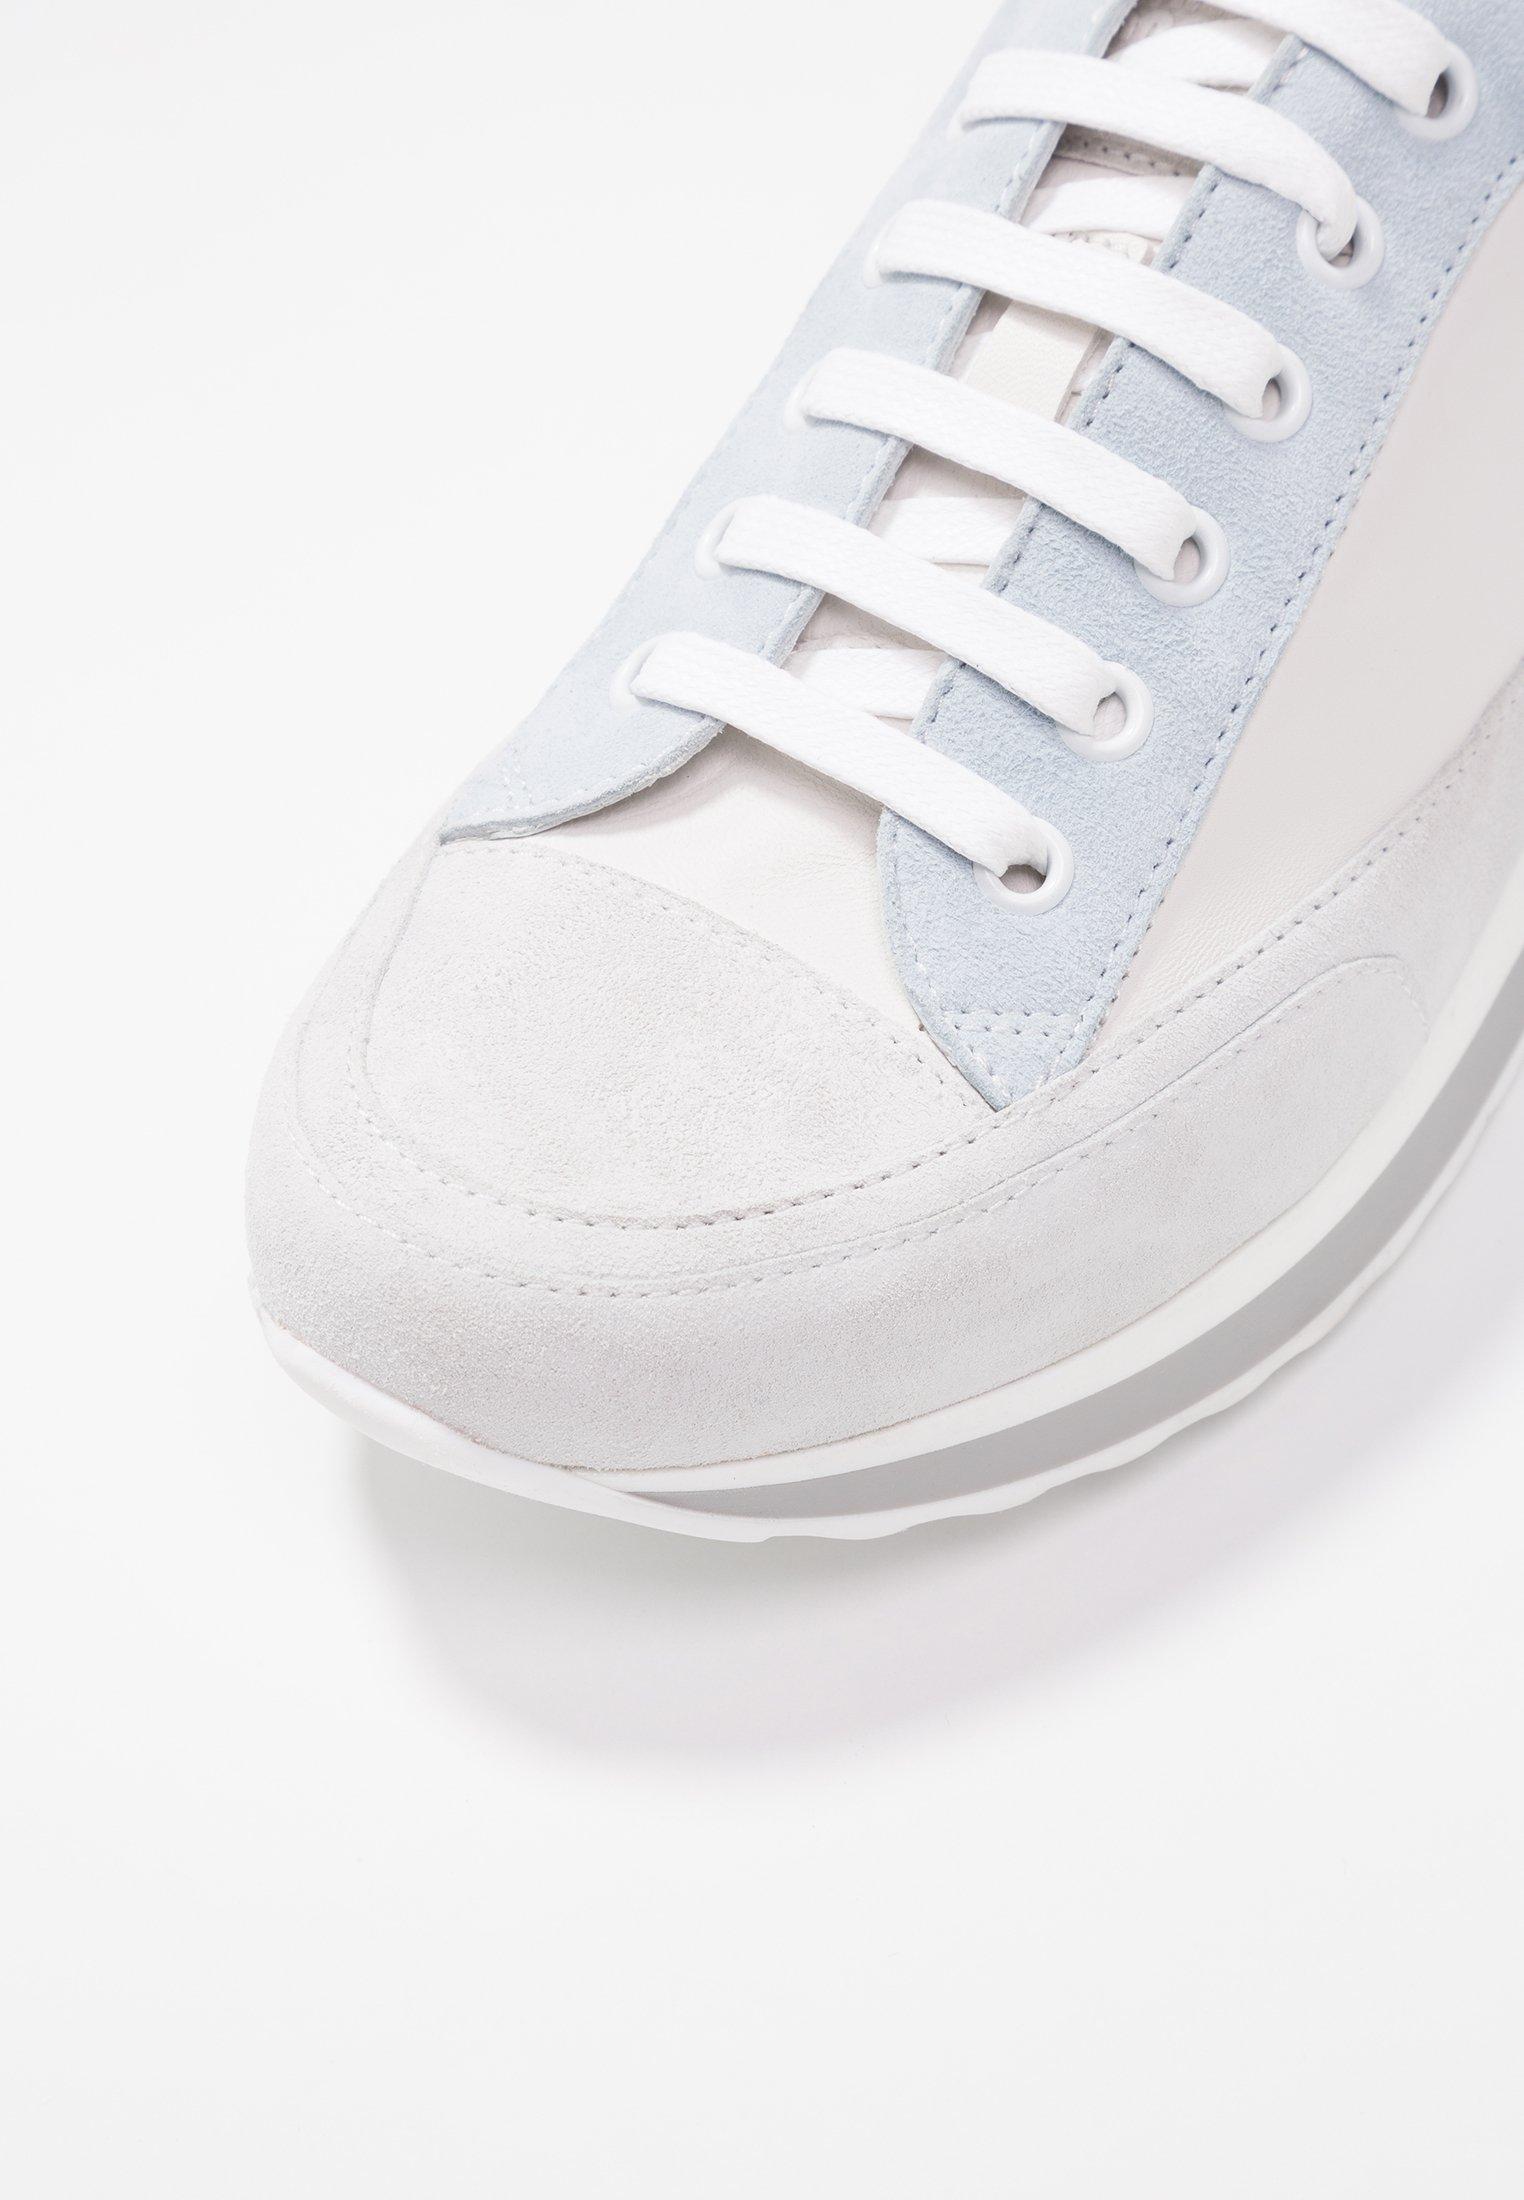 Candice Cooper ROCK SPORT - Baskets basses - bianco/ice